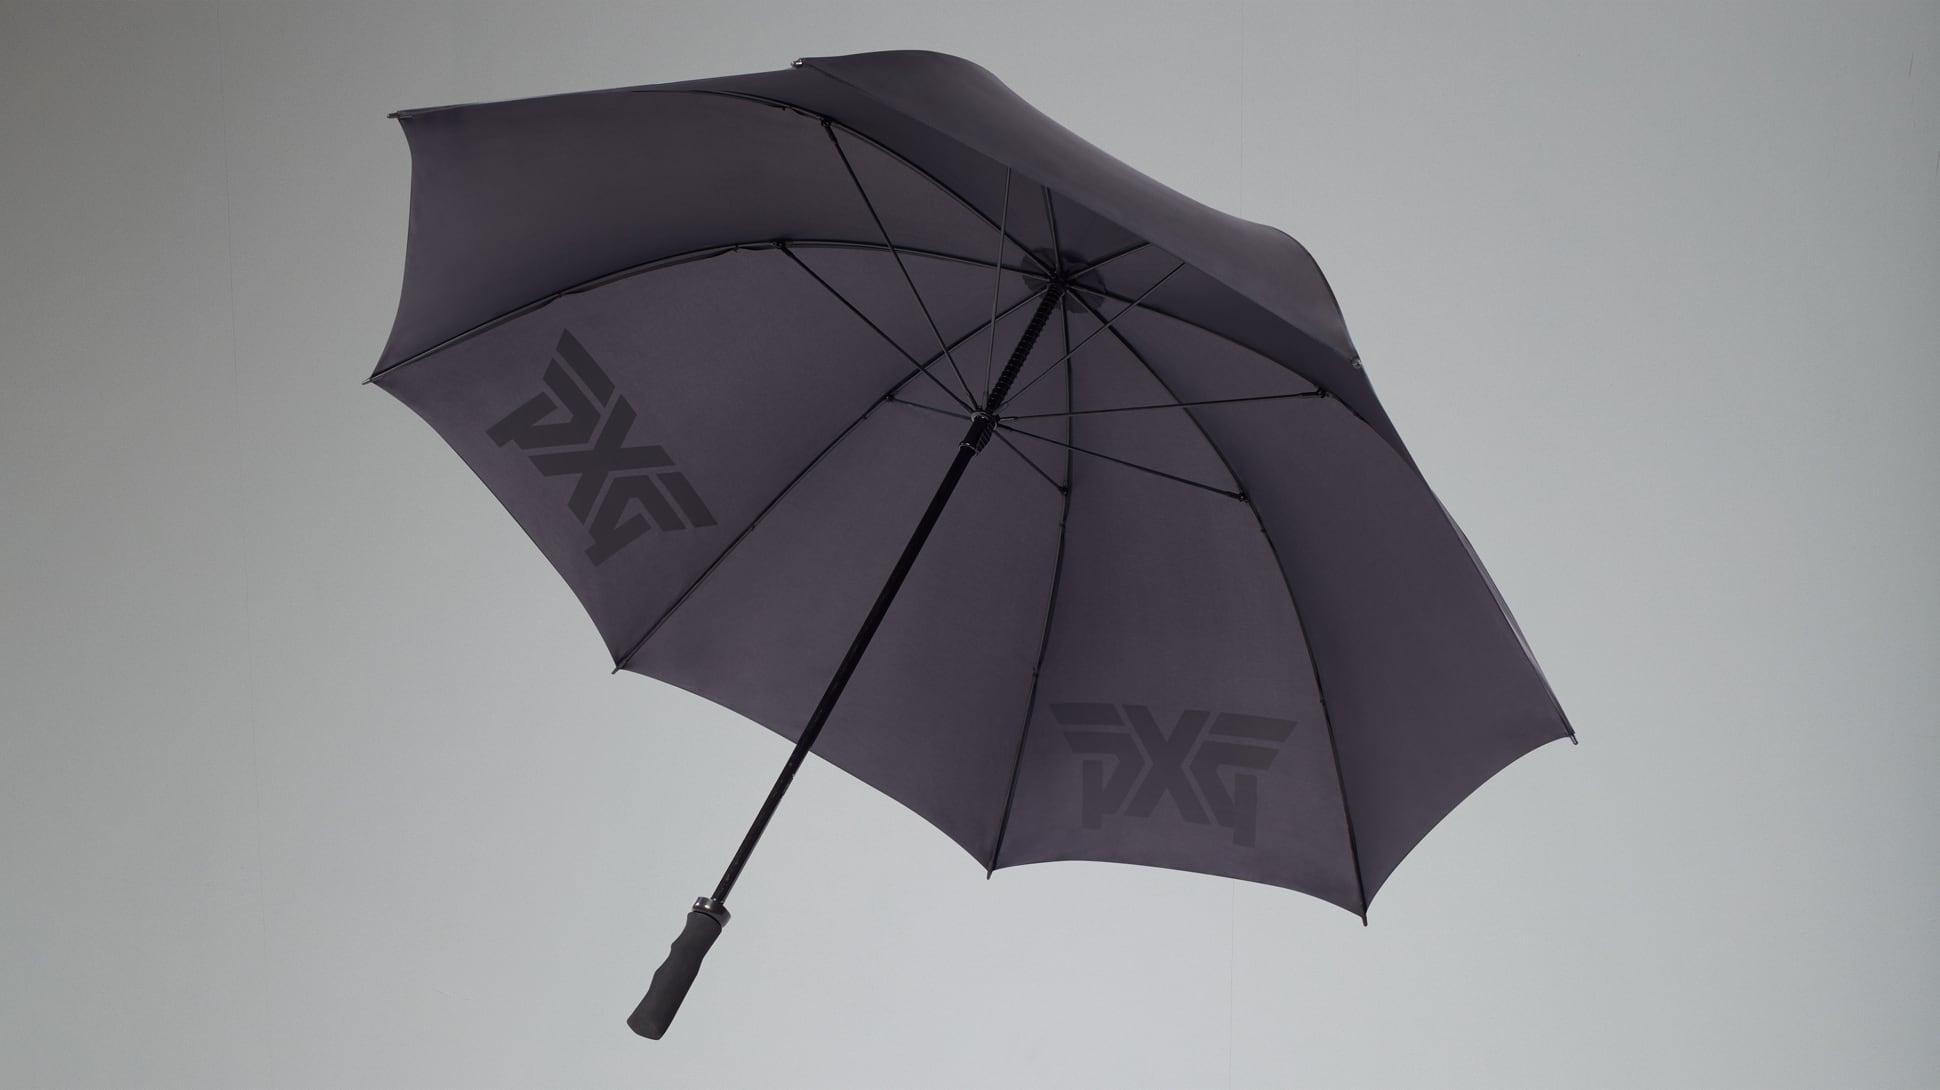 Single Canopy Umbrella Image 2